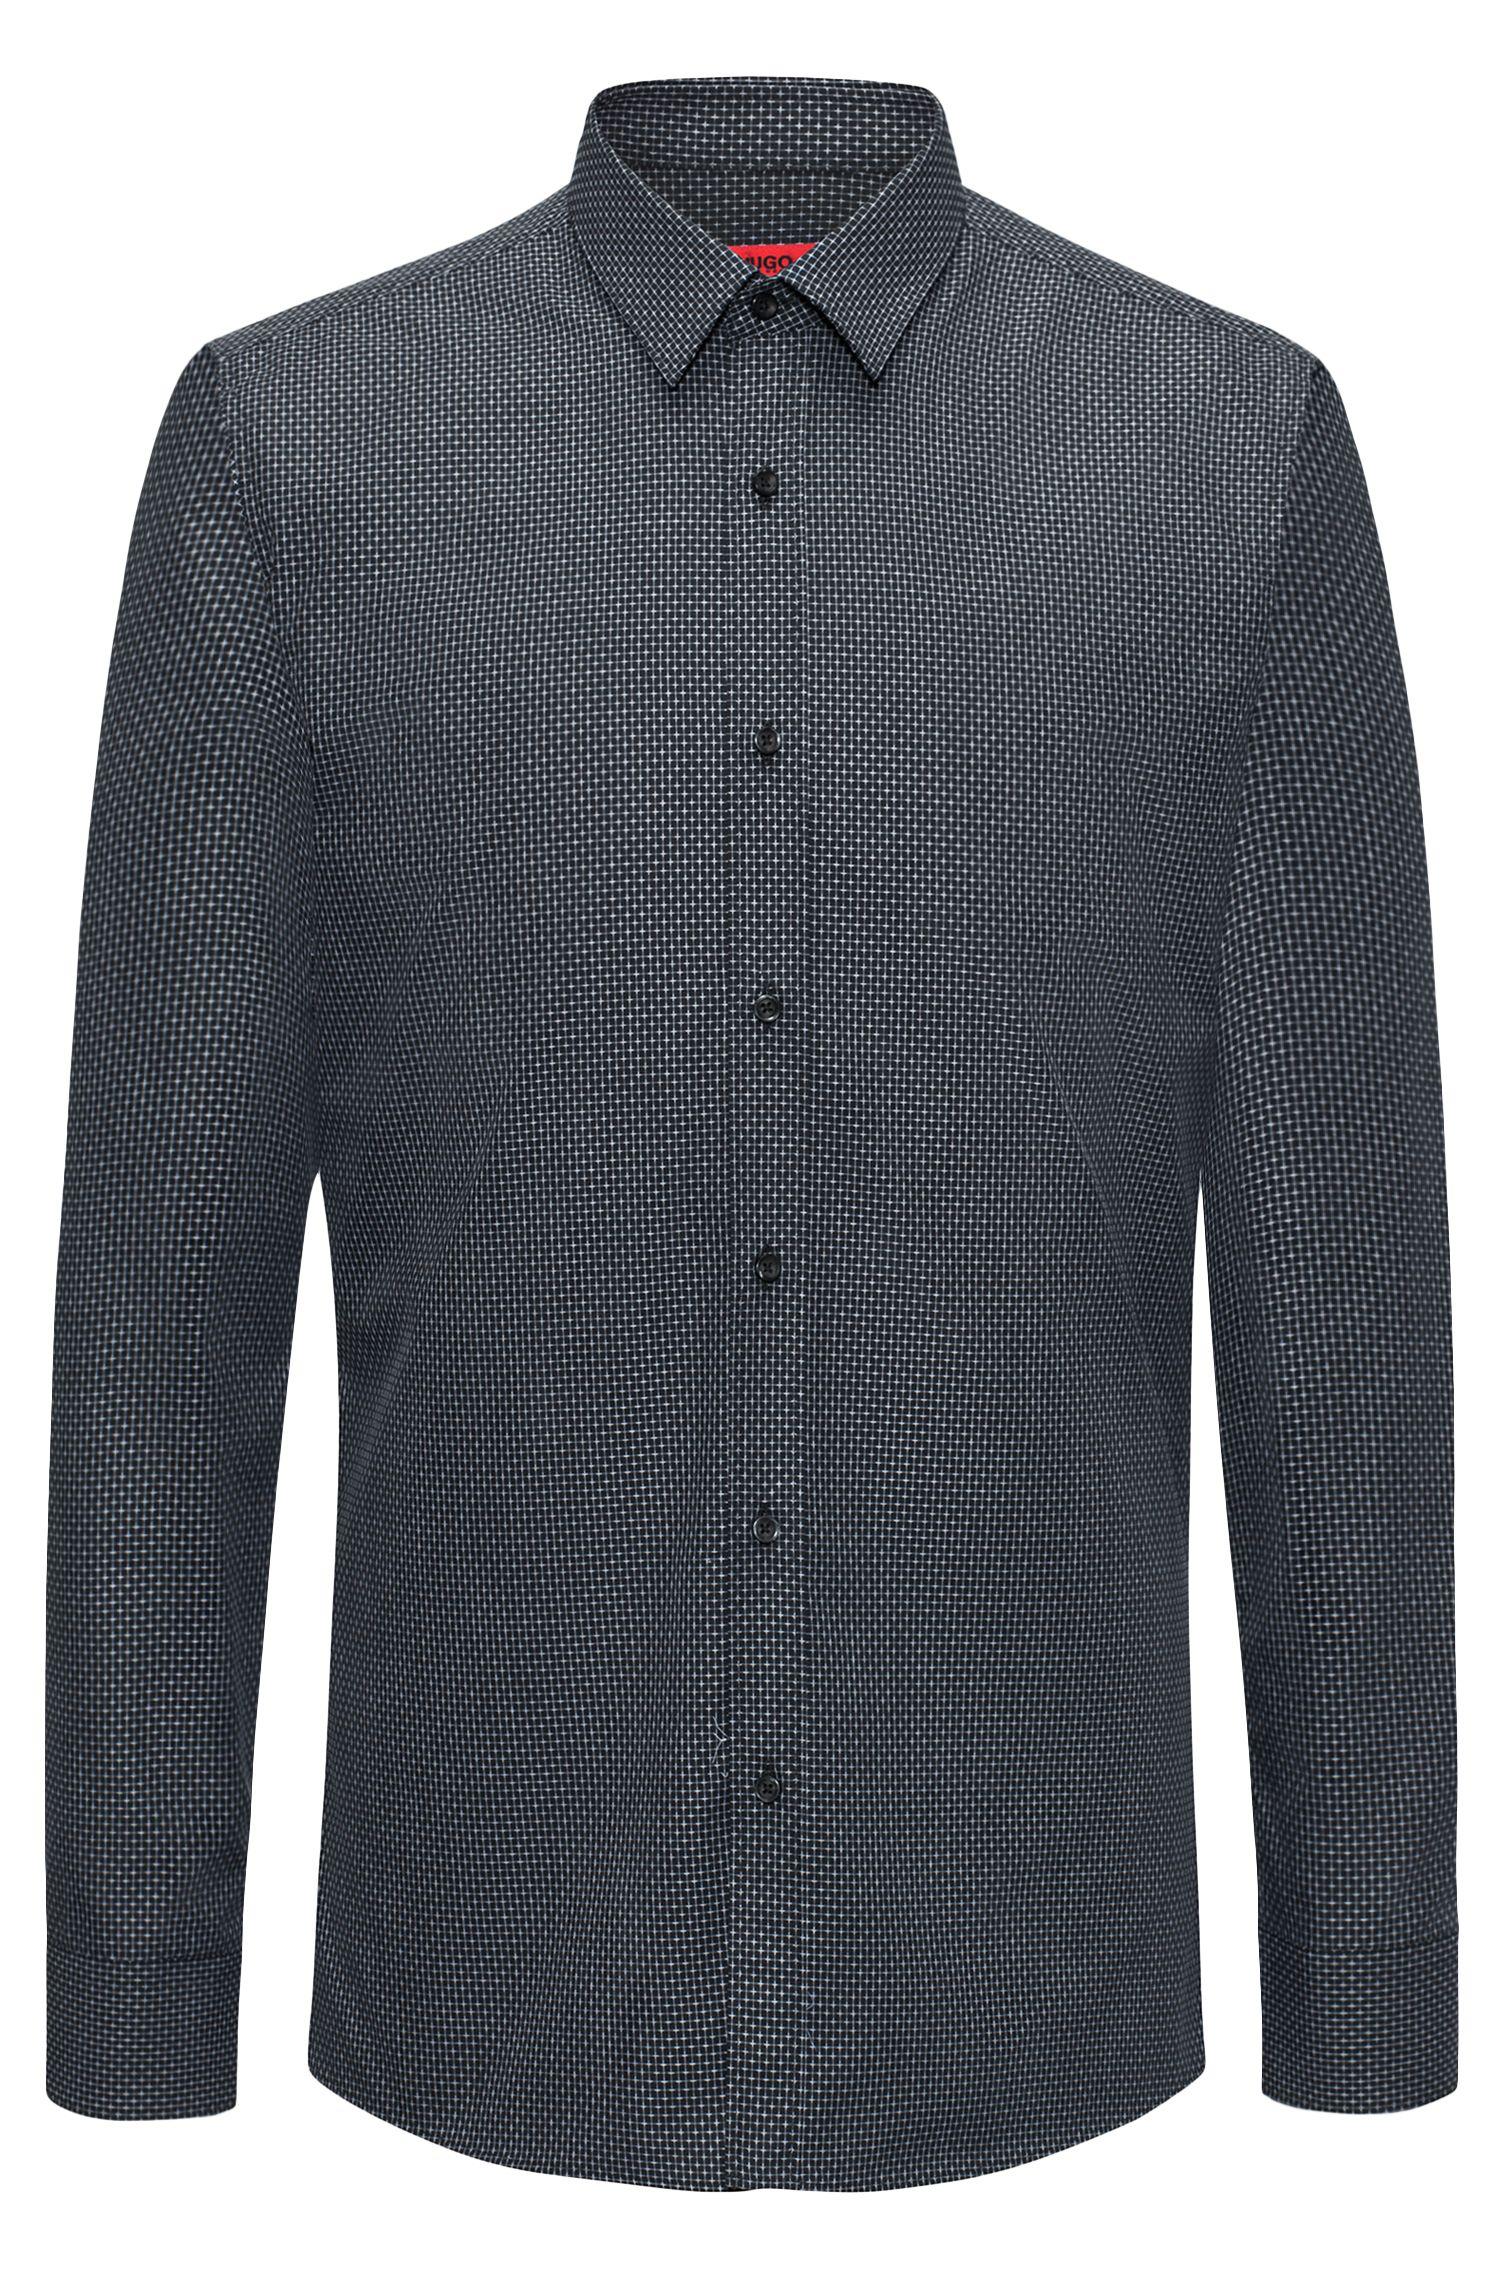 Patterned Cotton Dress Shirt, Extra Slim Fit   Elisha